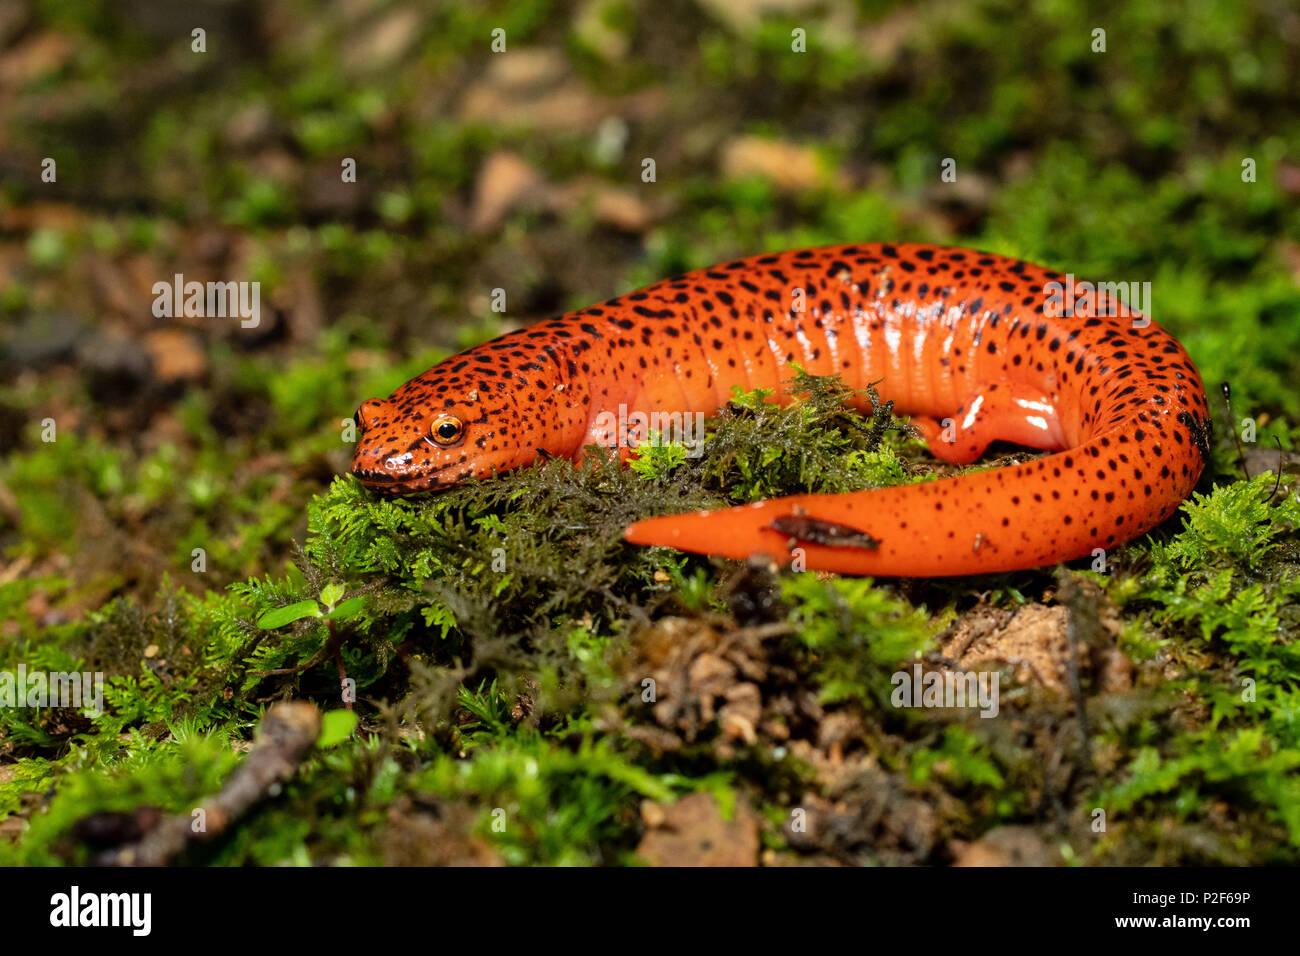 colorful salamander stock photos colorful salamander stock images